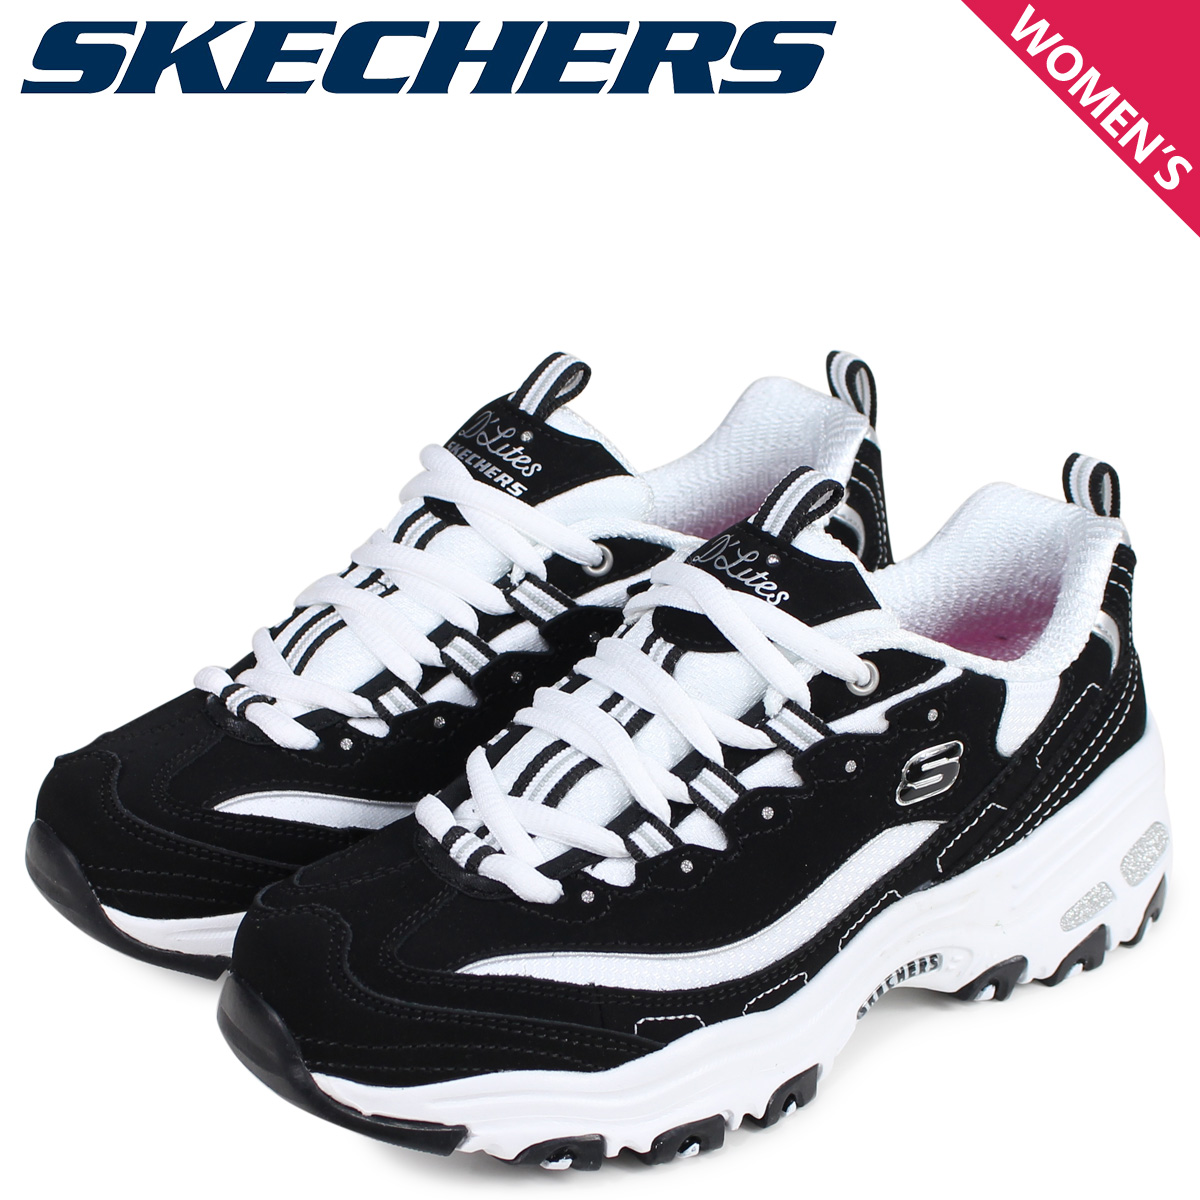 SKECHERS スケッチャーズディライトスニーカーレディースディーライト D LITES BIGGEST FAN black black 11930